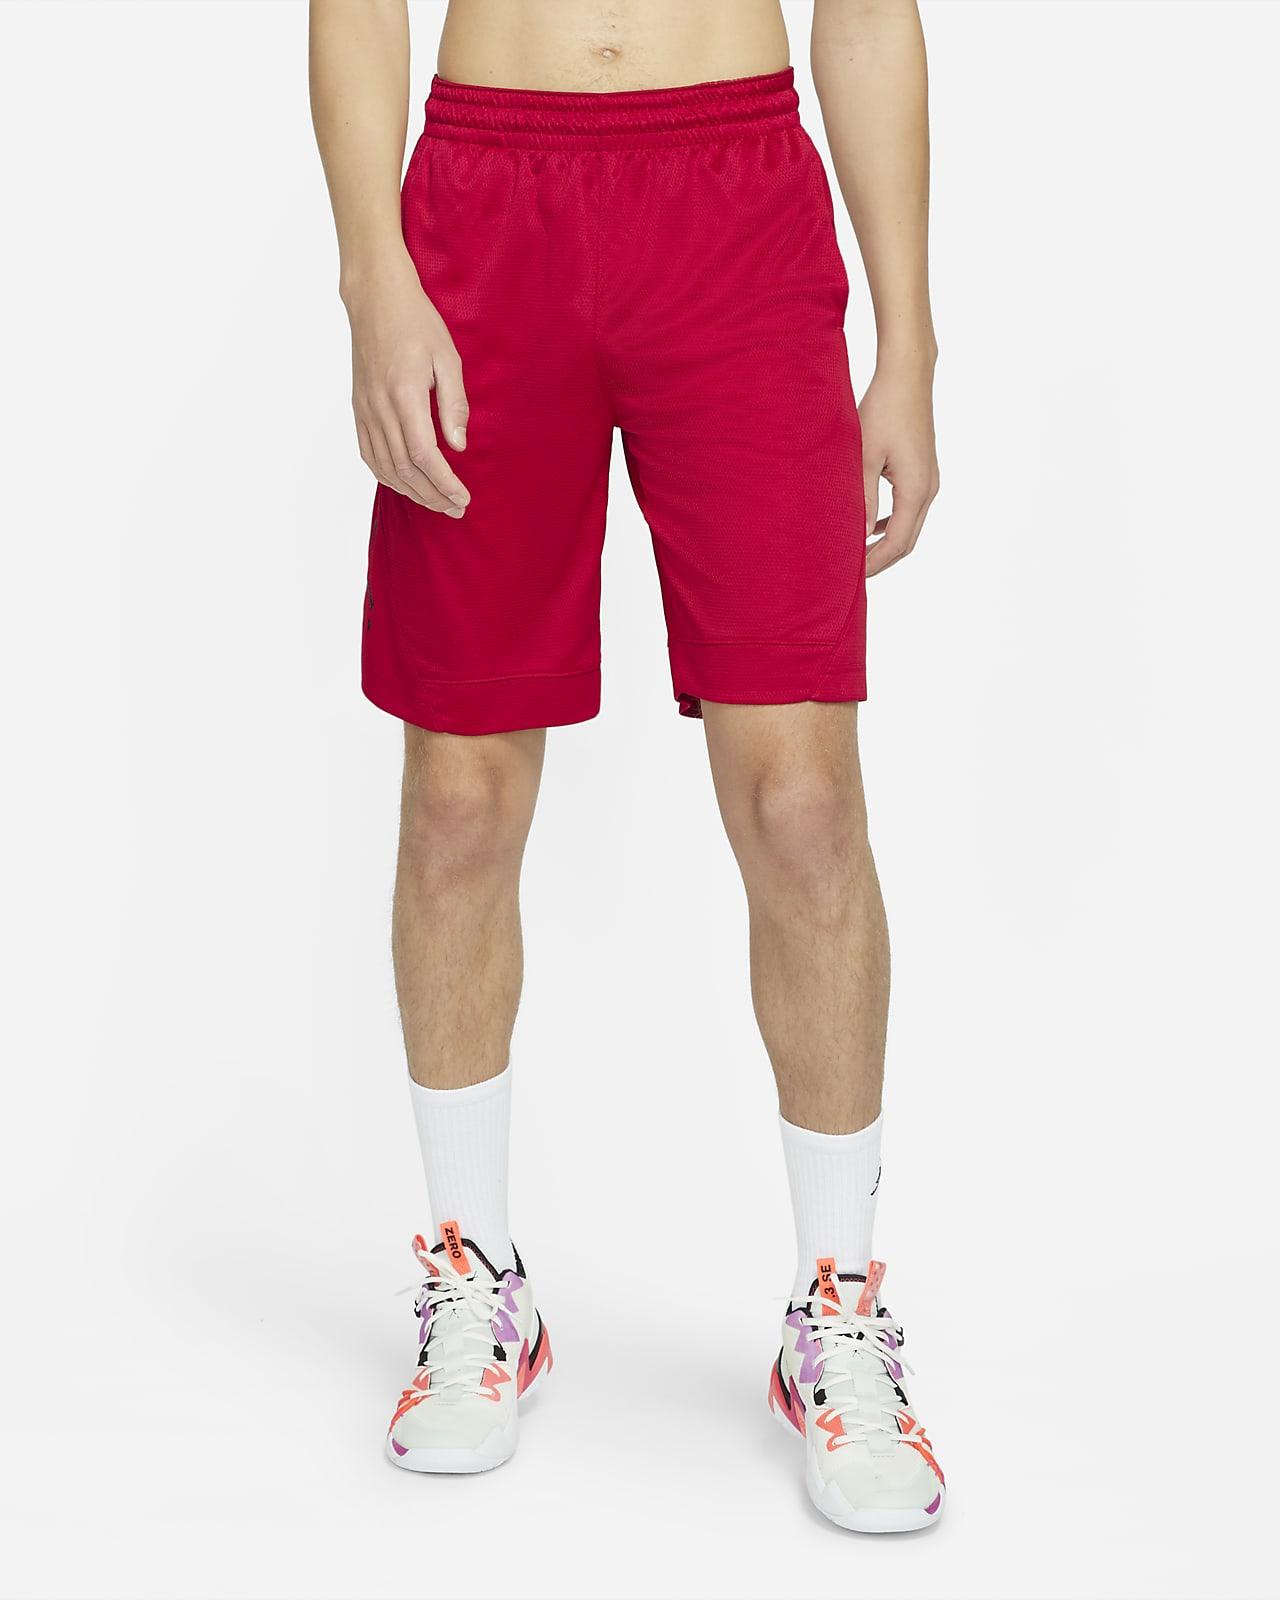 Jordan Rise Striped Triangle Men's Basketball Shorts